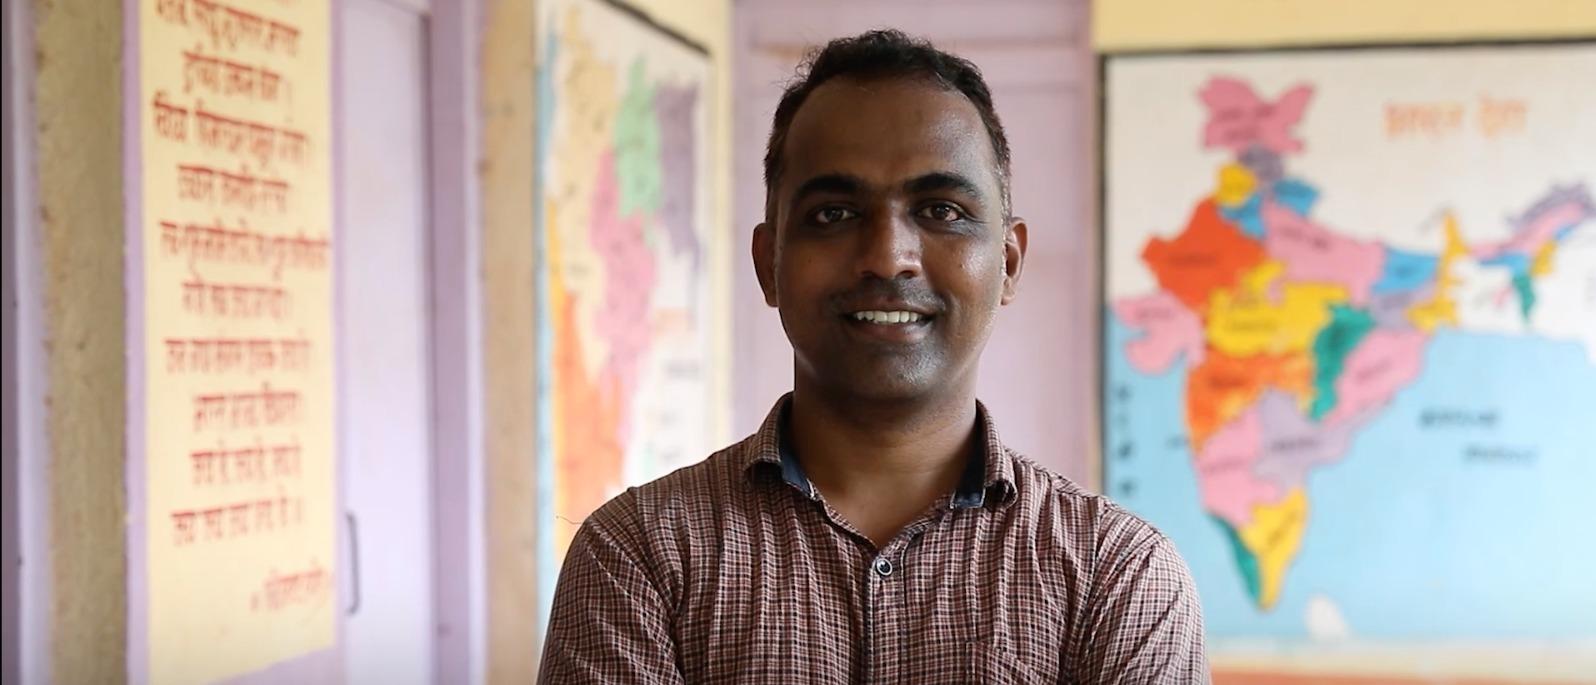 Primary School Teacher from Paritewadi in Maharashtra wins 2020 Global Teacher Prize with US $ 1 million award